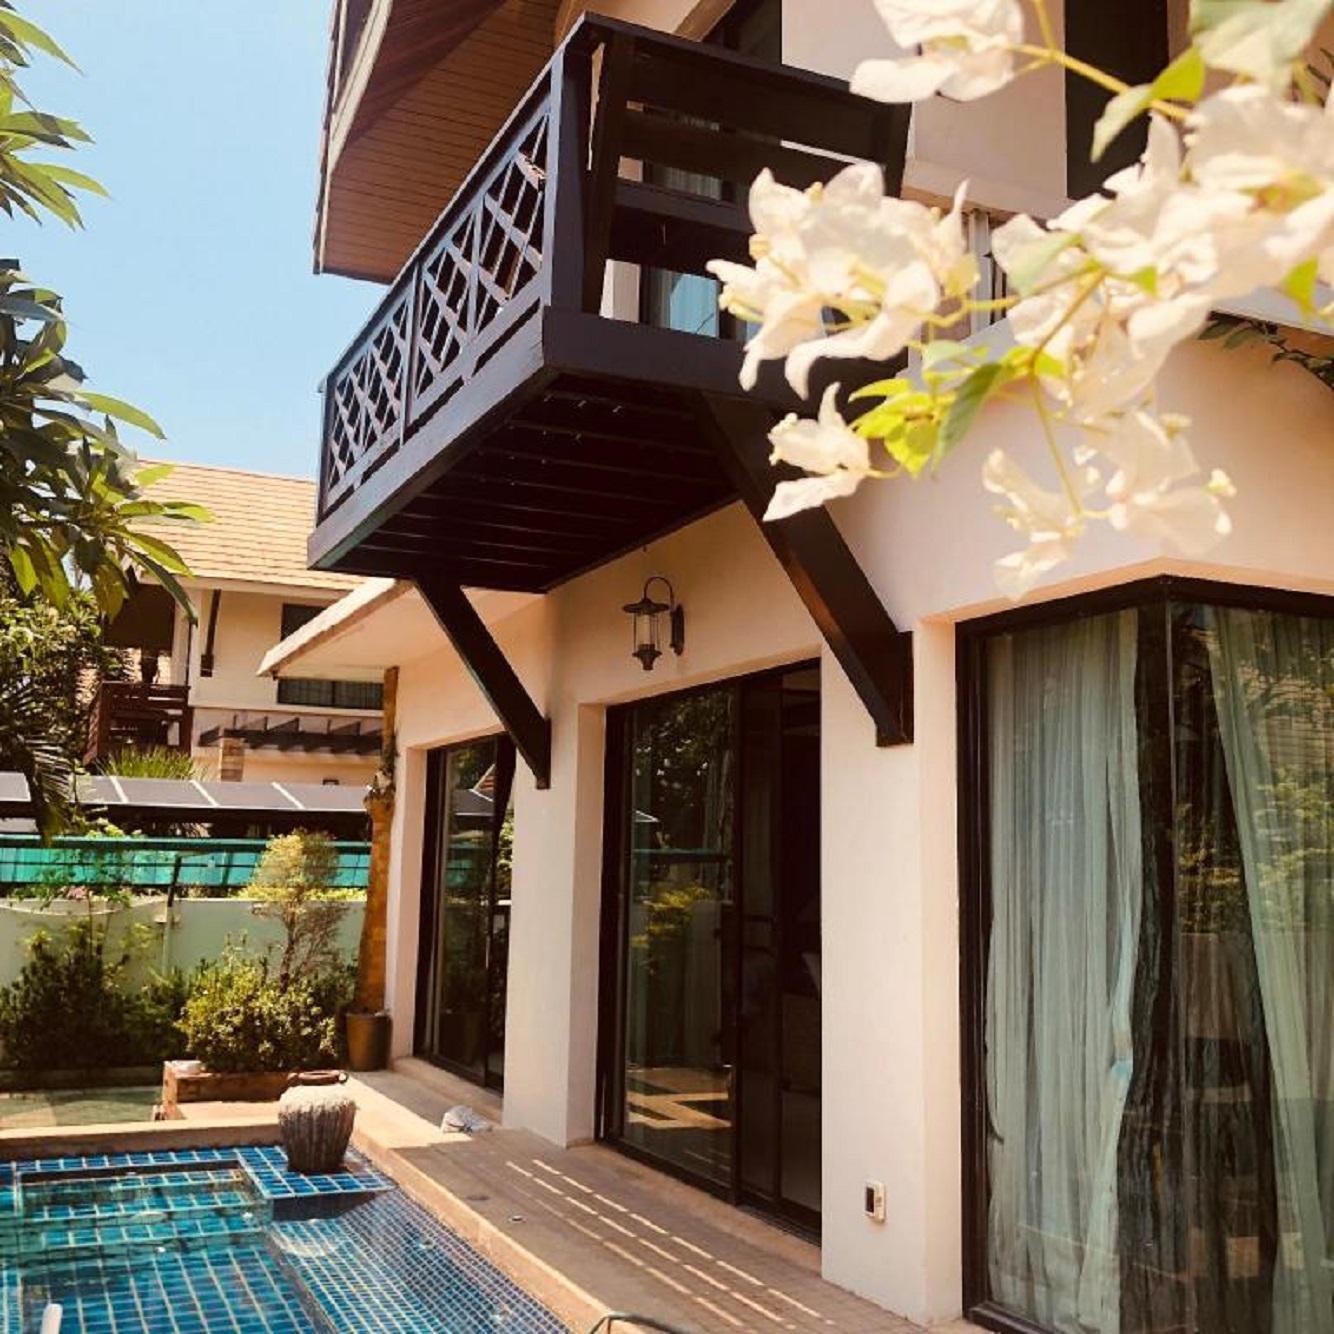 Luxury Villa In Pattaya Walking Street450 2